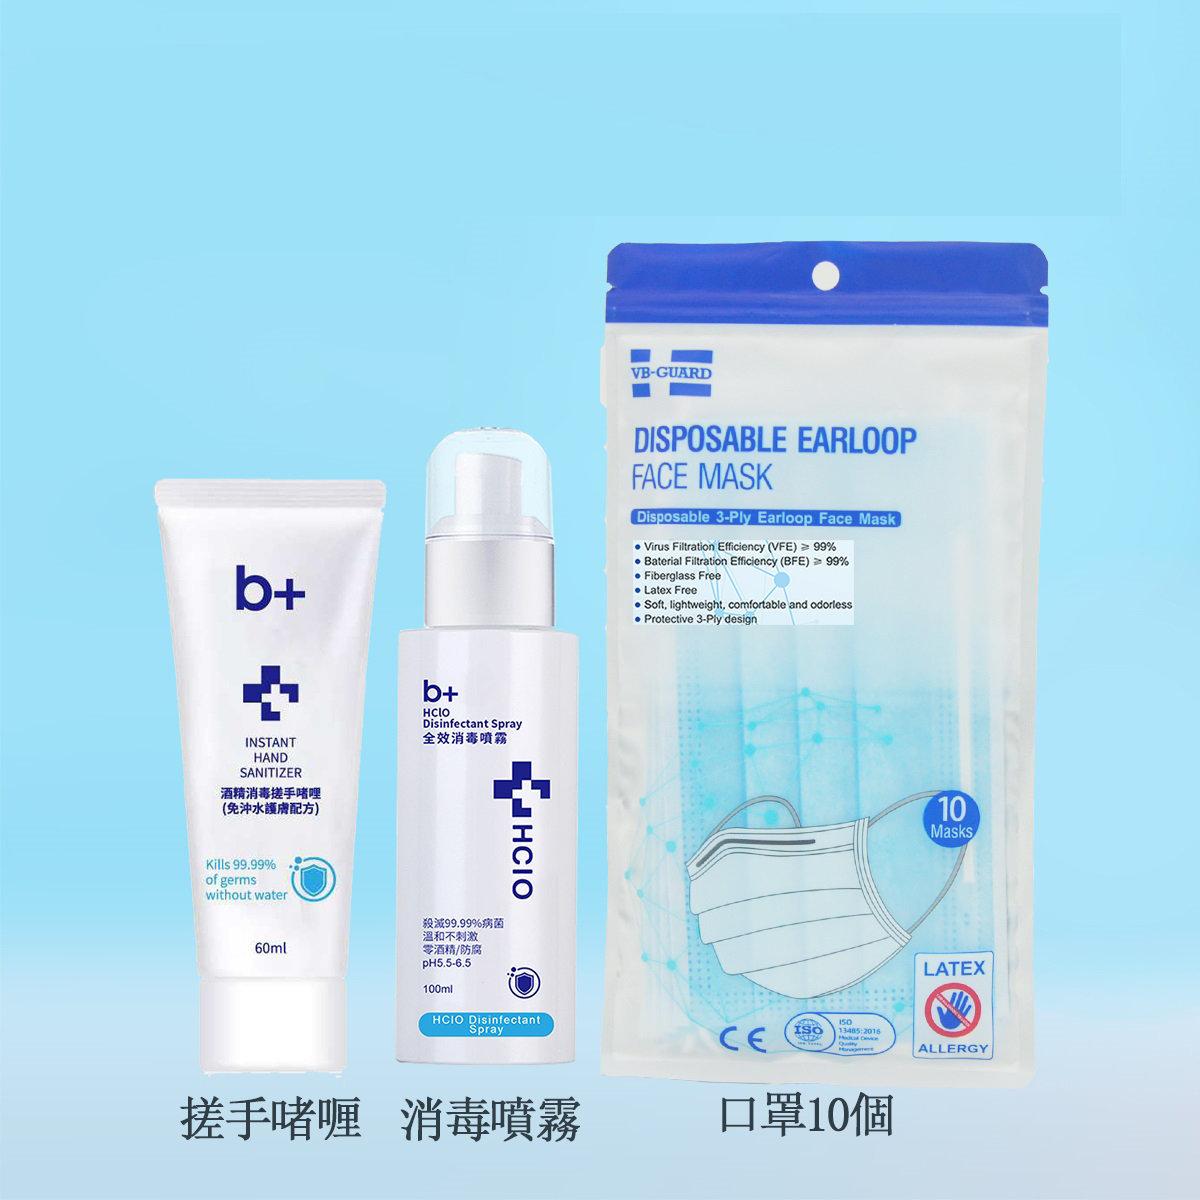 Anti-epidemic 3 items set - Face Mask 10pcs + Hand Sanitizer 60ml + HClO Disinfectant Spray 100ml